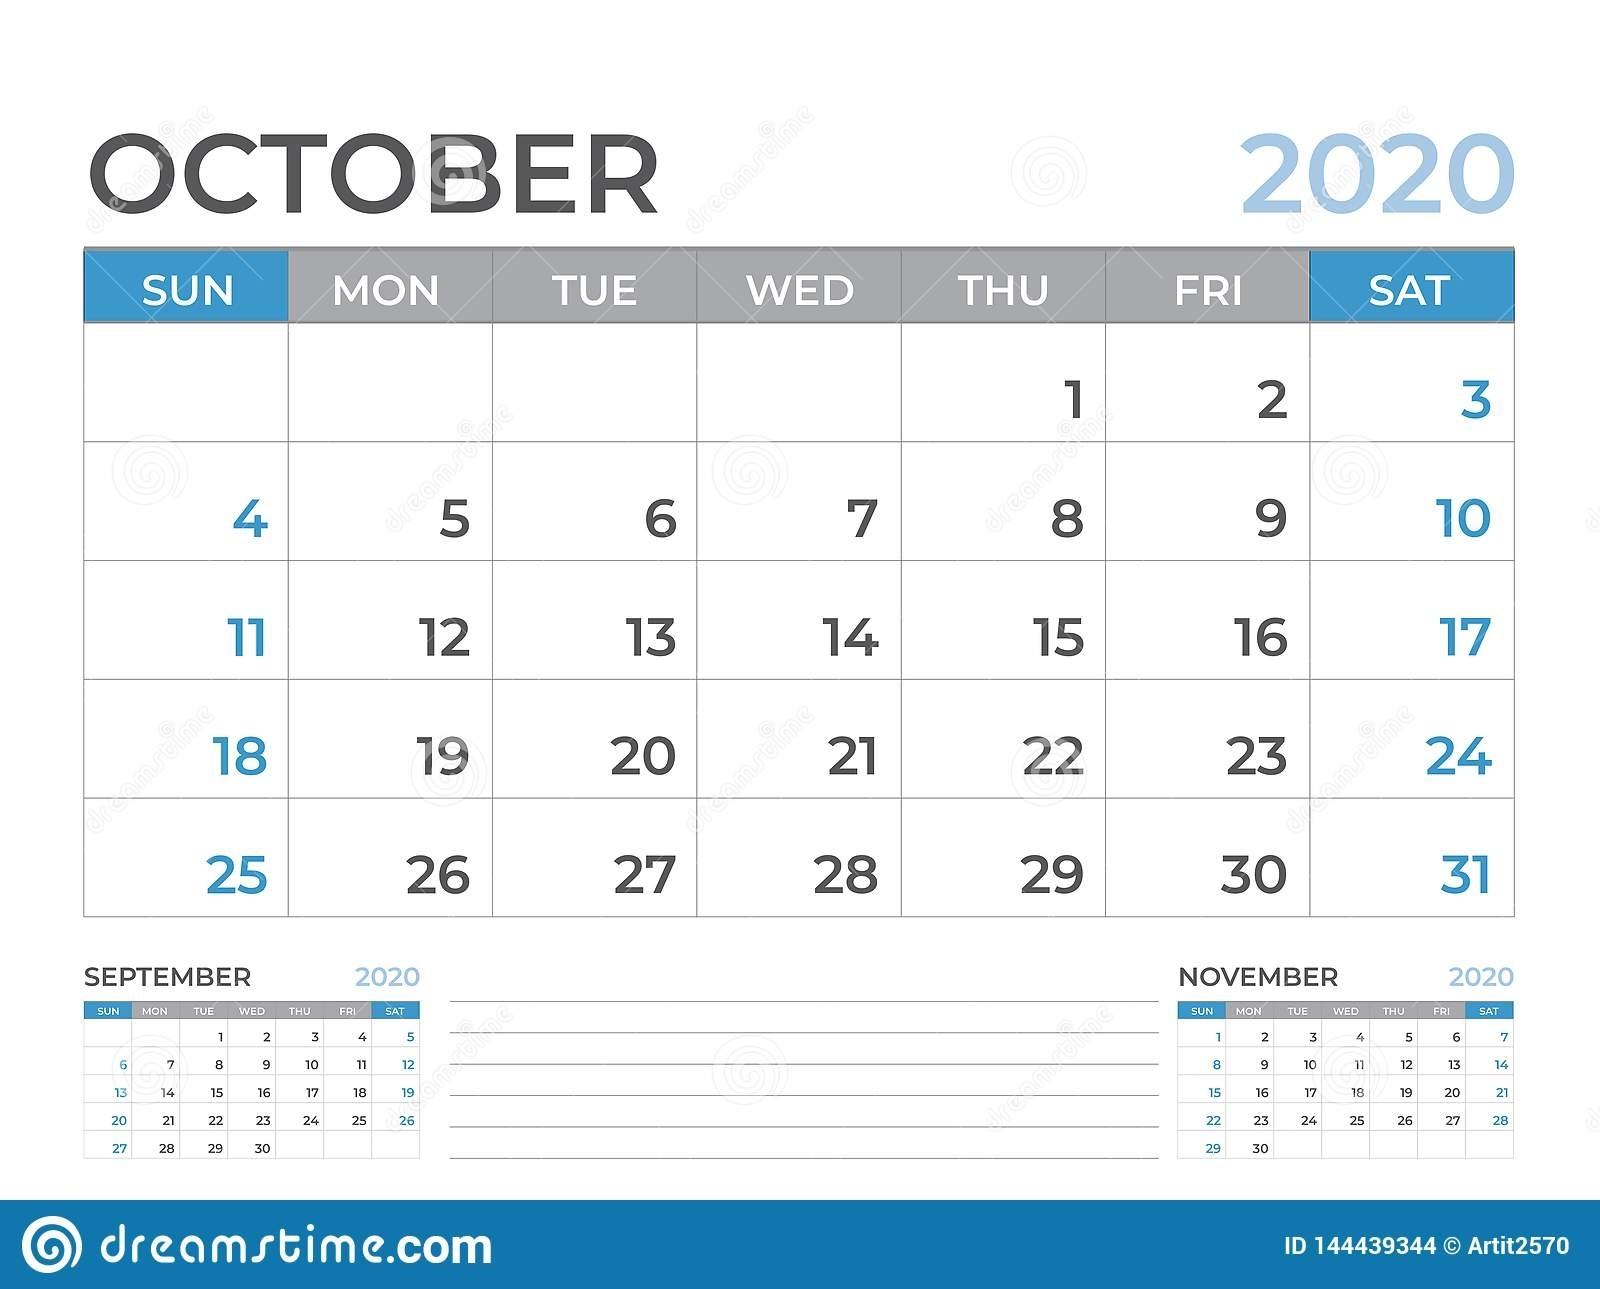 October 2020 Calendar Template, Desk Calendar Layout Size 8